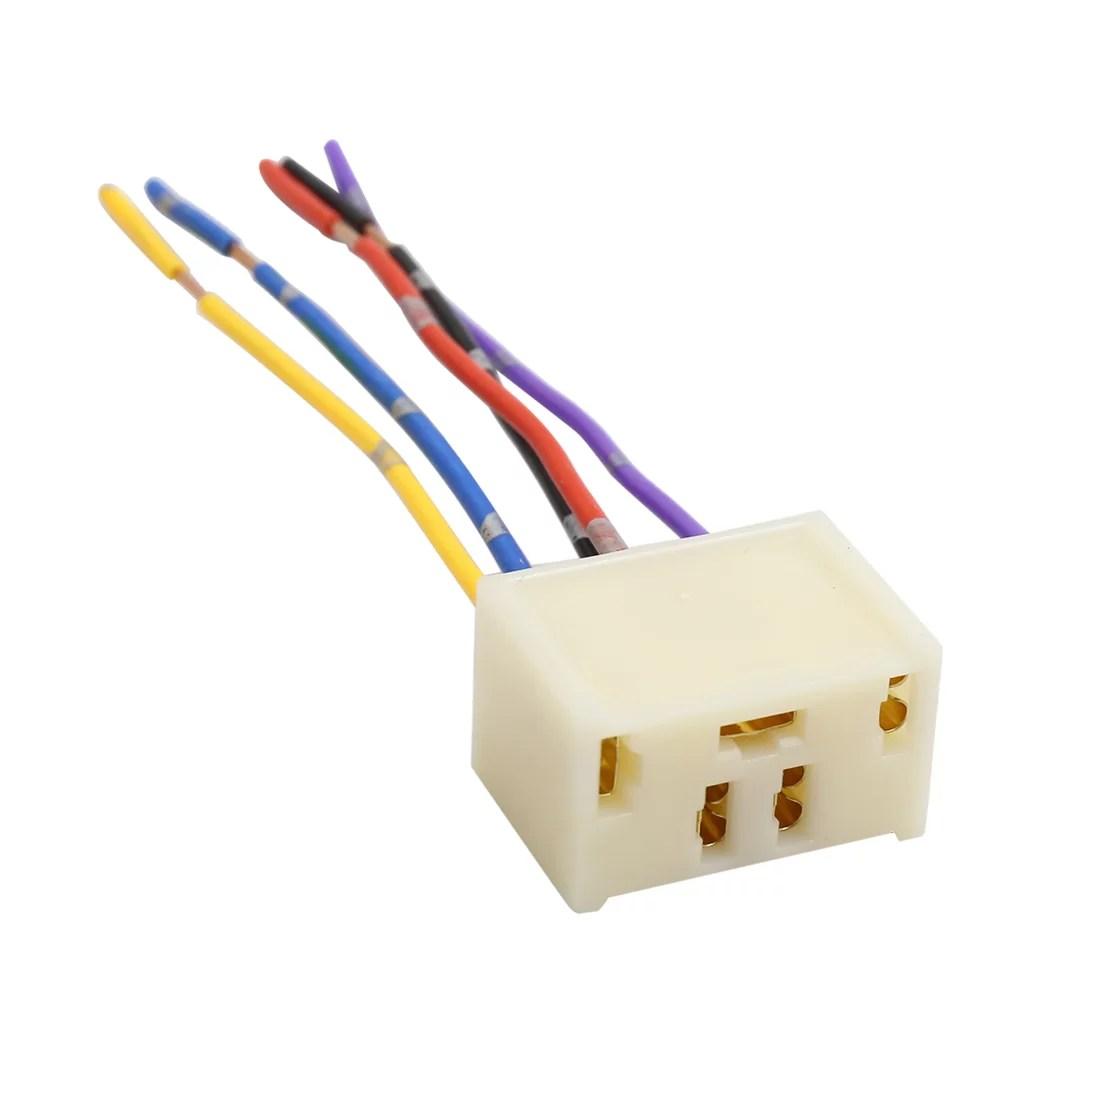 medium resolution of 4pcs dc 12v 5 pin car power window switch socket wiring harness plug 3 wire harness repair window